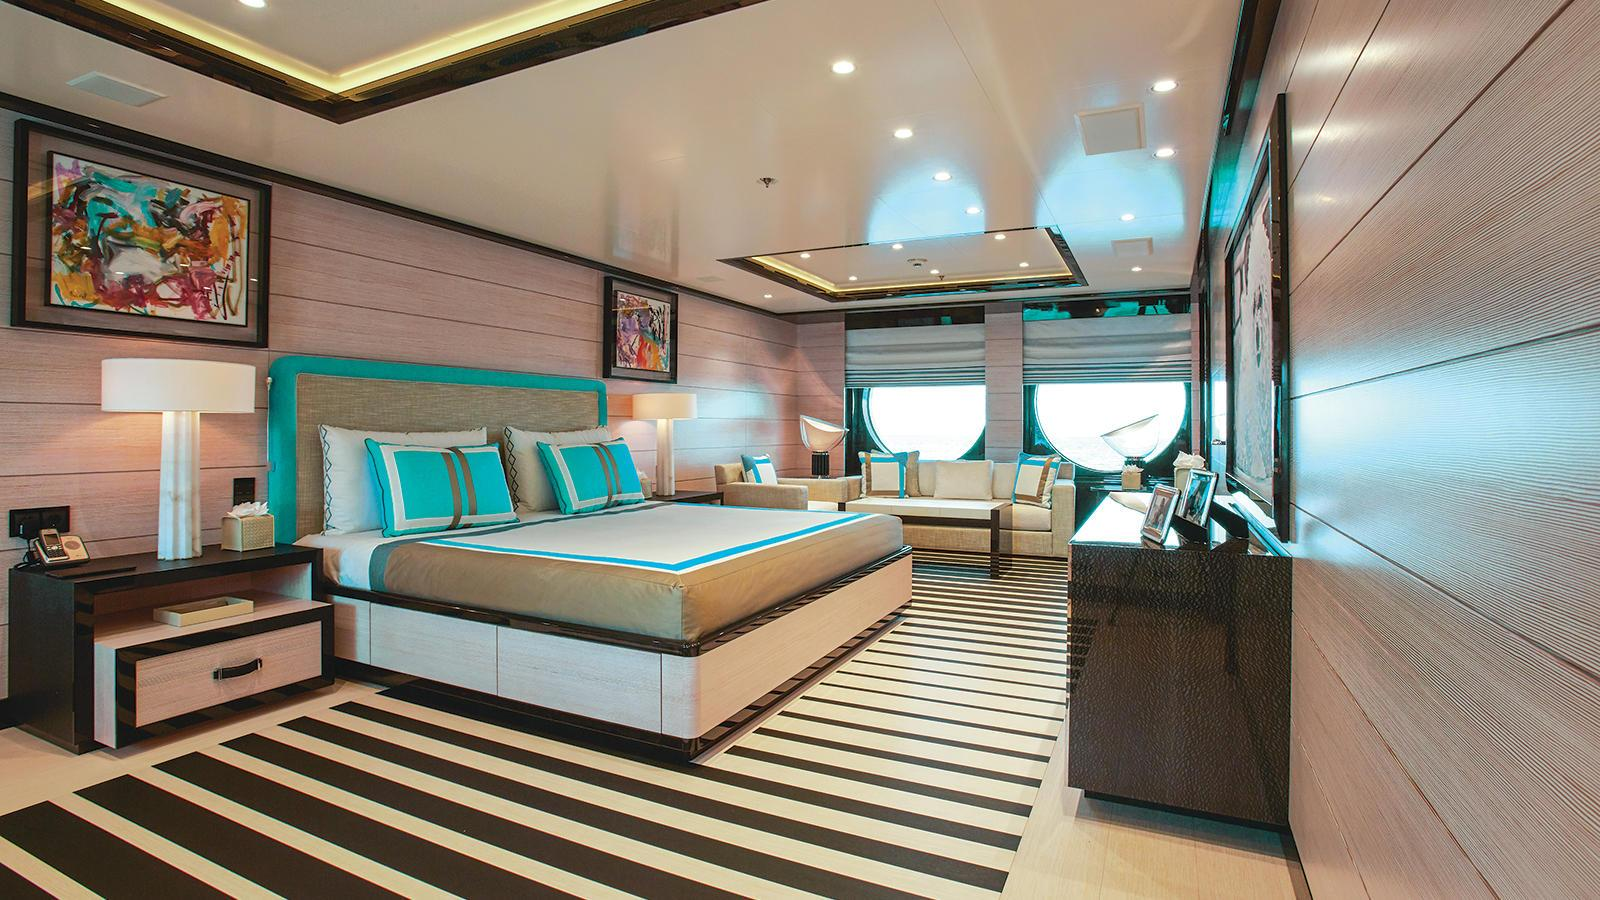 madame-kate-motor-yacht-amels-1999-62m-2015-master-stateroom